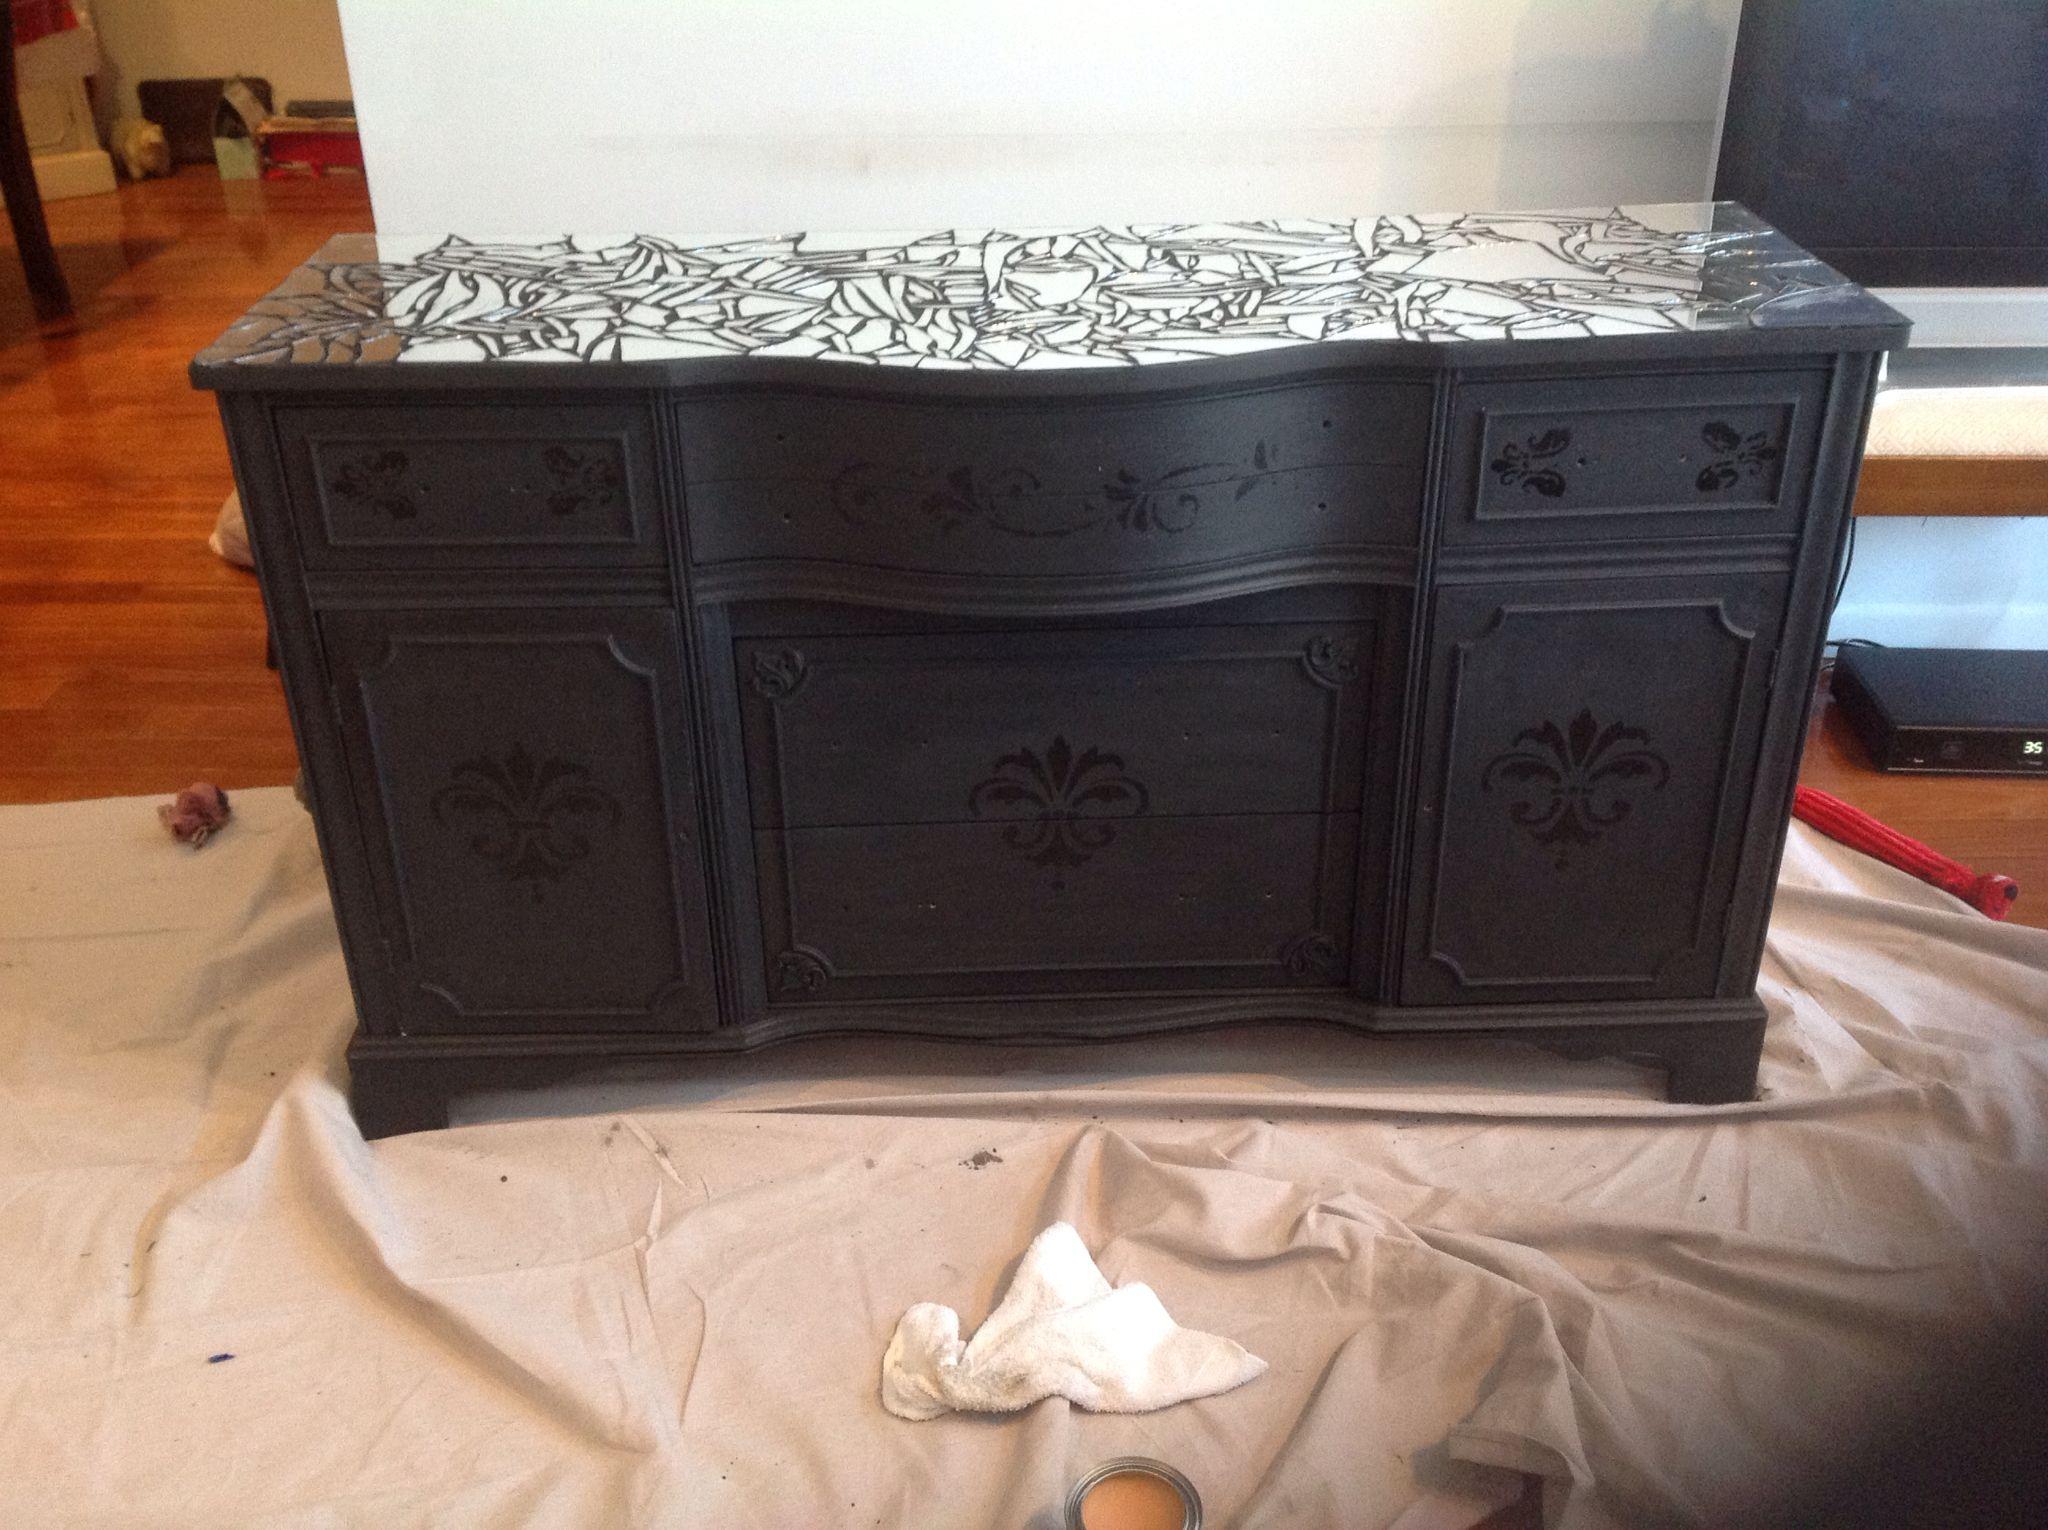 Black chalk painted dresser cracked mirror tiled top